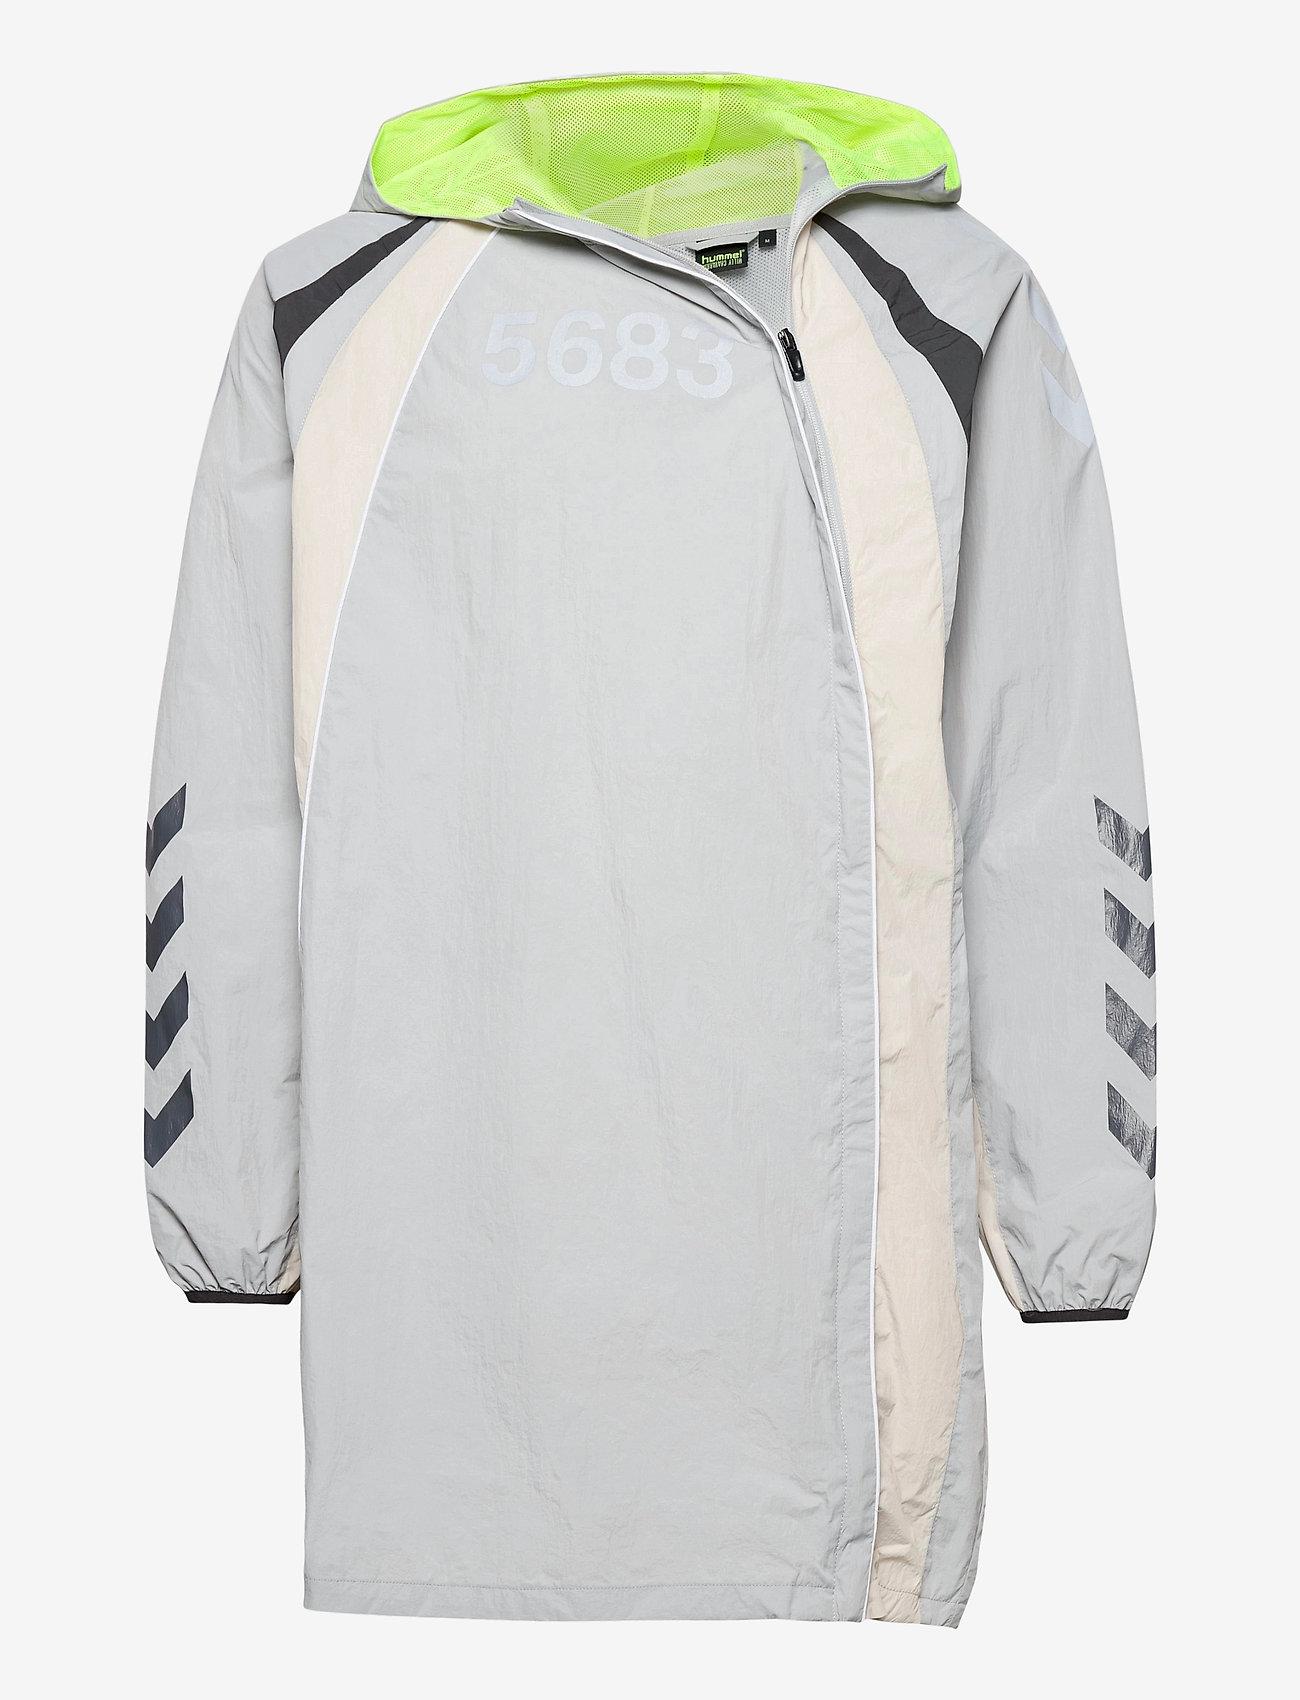 Hummel - hmlWILLY LONG JACKET - sports jackets - harbor mist - 0